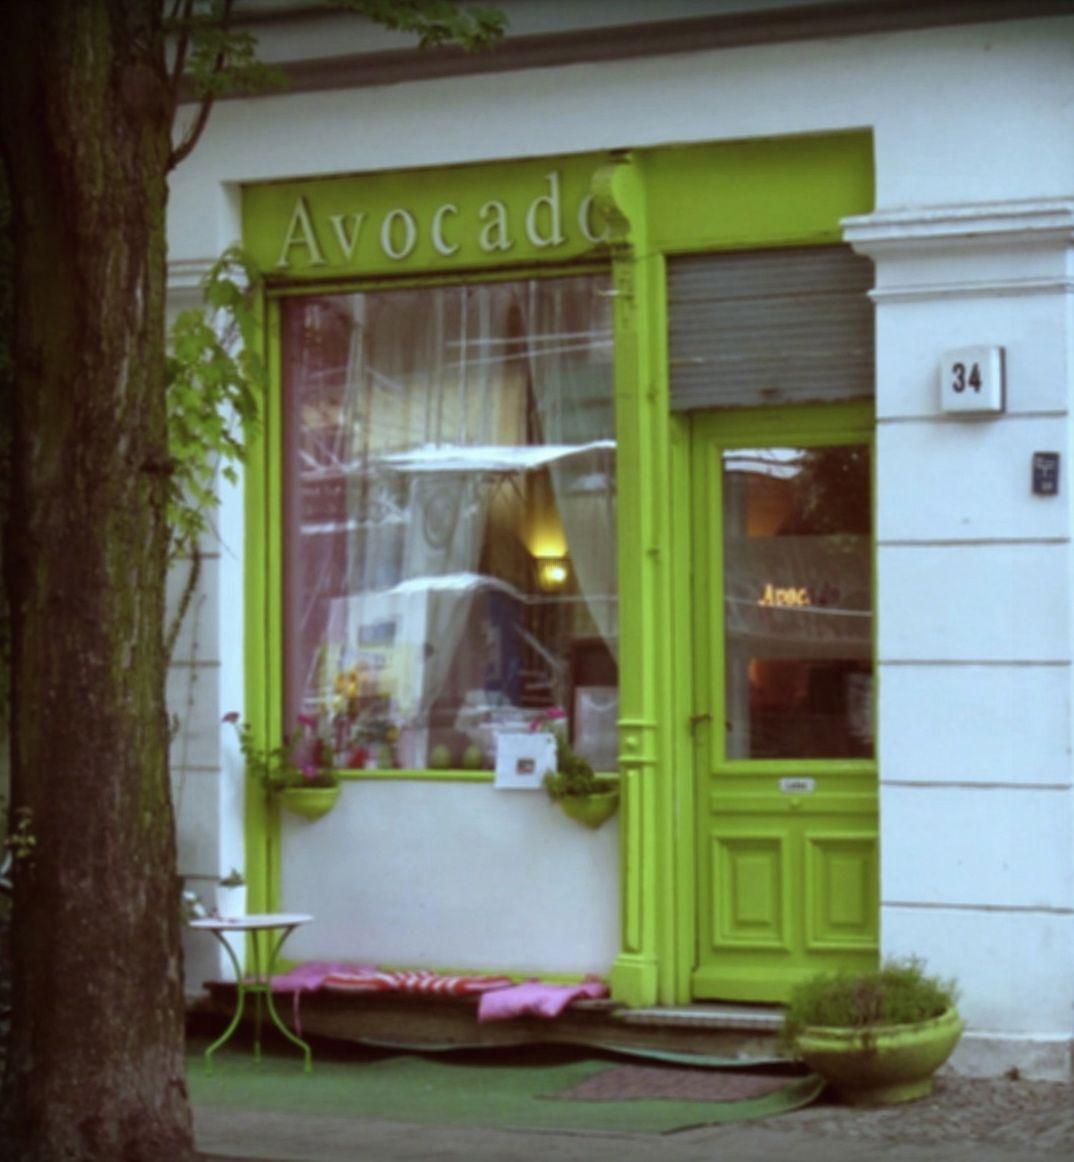 avocado kosmetikstudio berlin prenzlauer berg auf i love spa blog studio studio. Black Bedroom Furniture Sets. Home Design Ideas